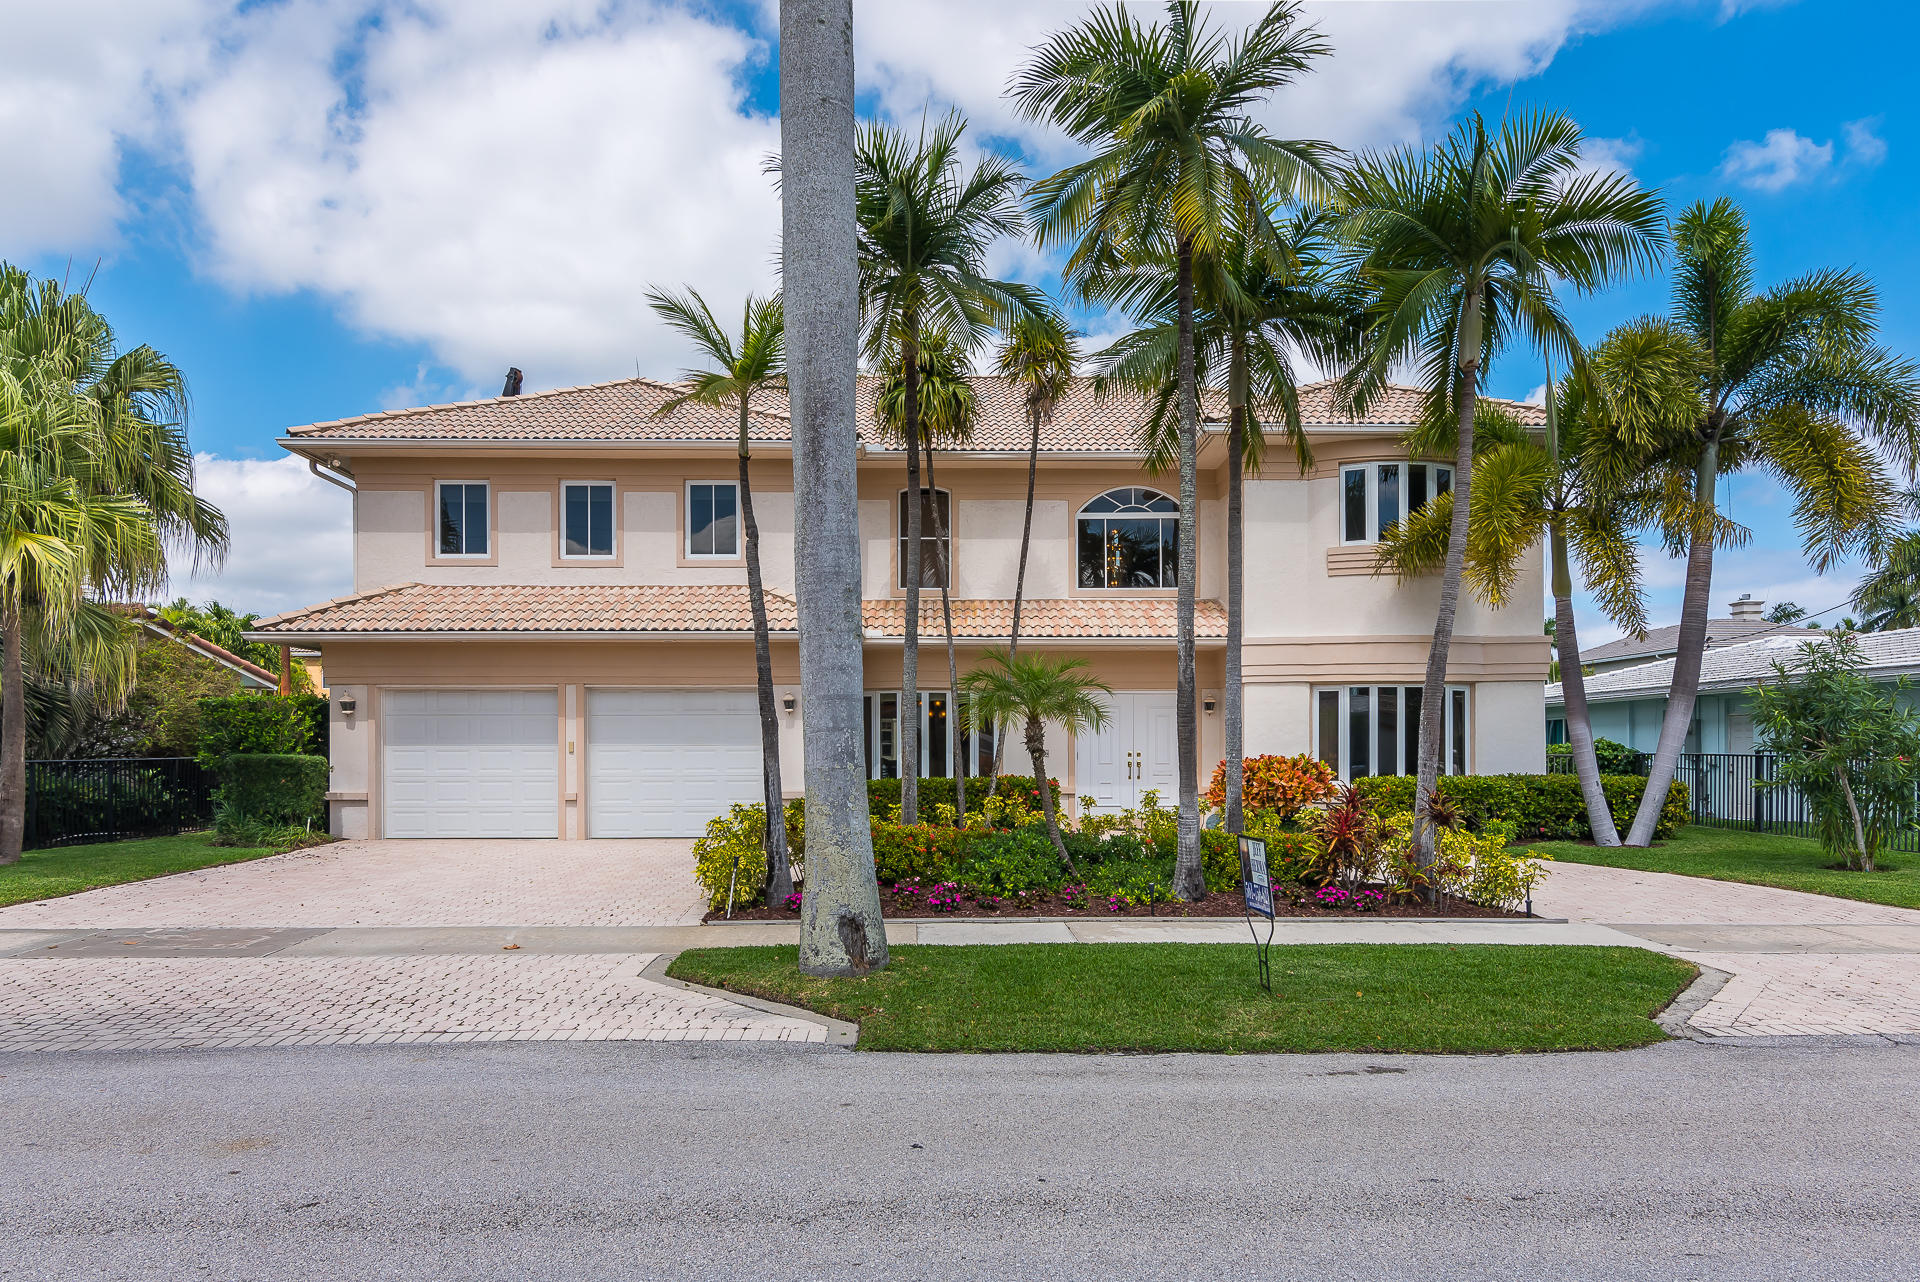 Photo of  Boca Raton, FL 33487 MLS RX-10396215